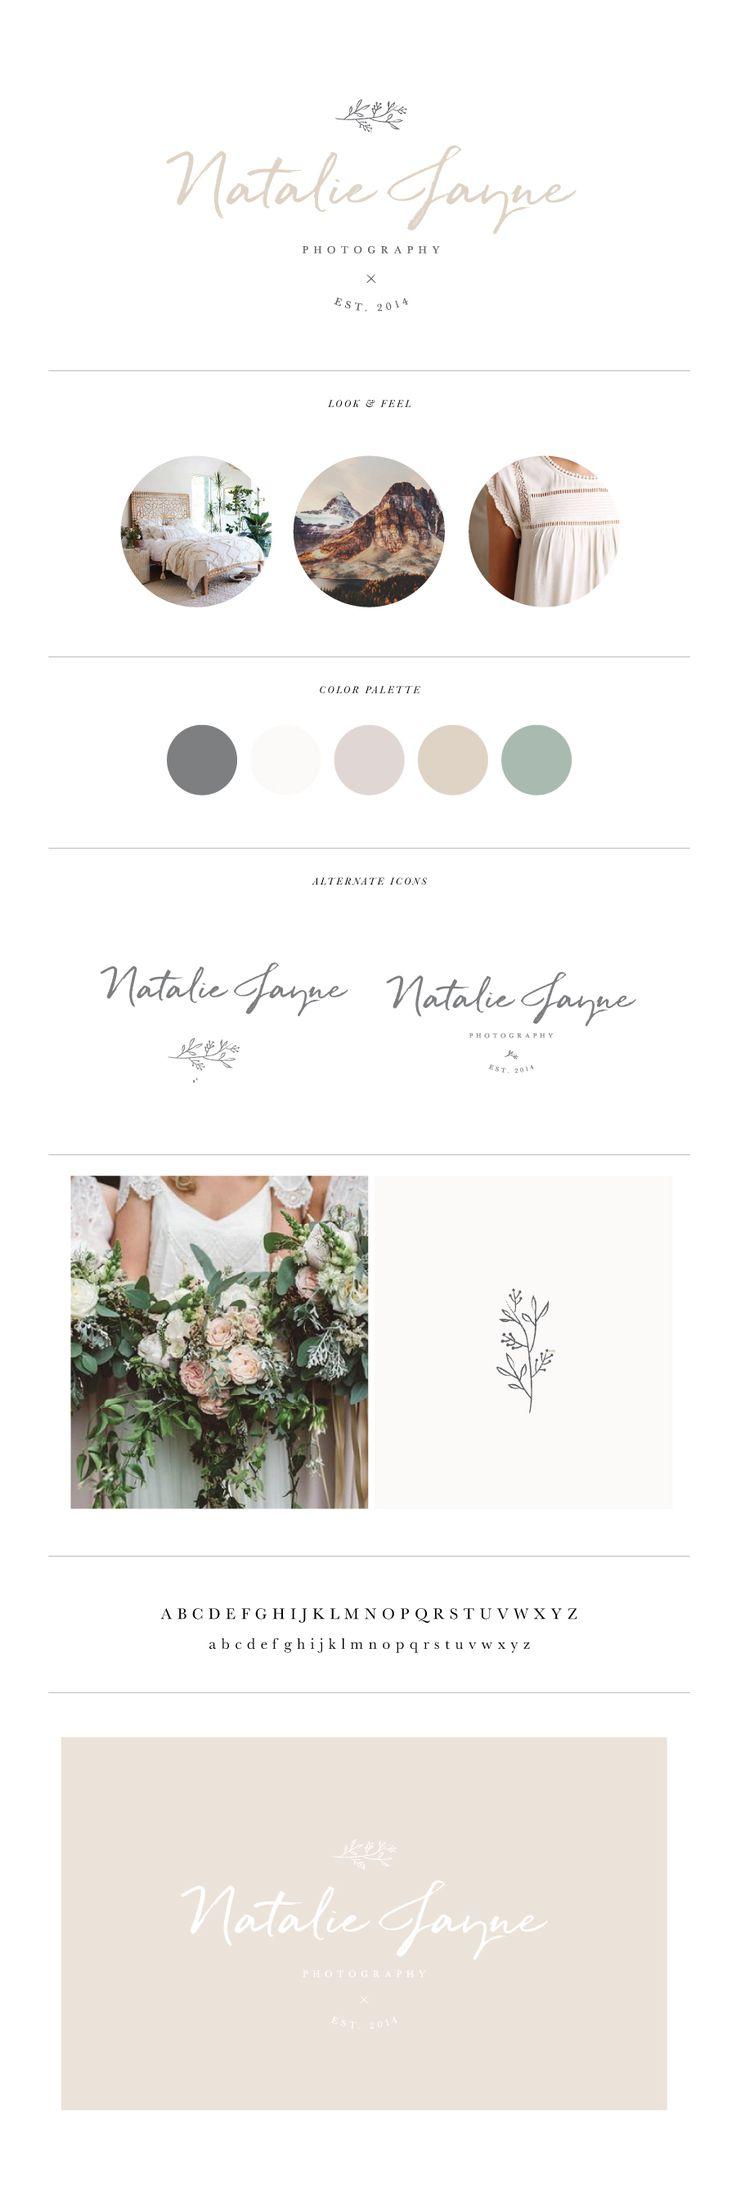 Customized Web site & Model Design – Natalie Jayne Pictures